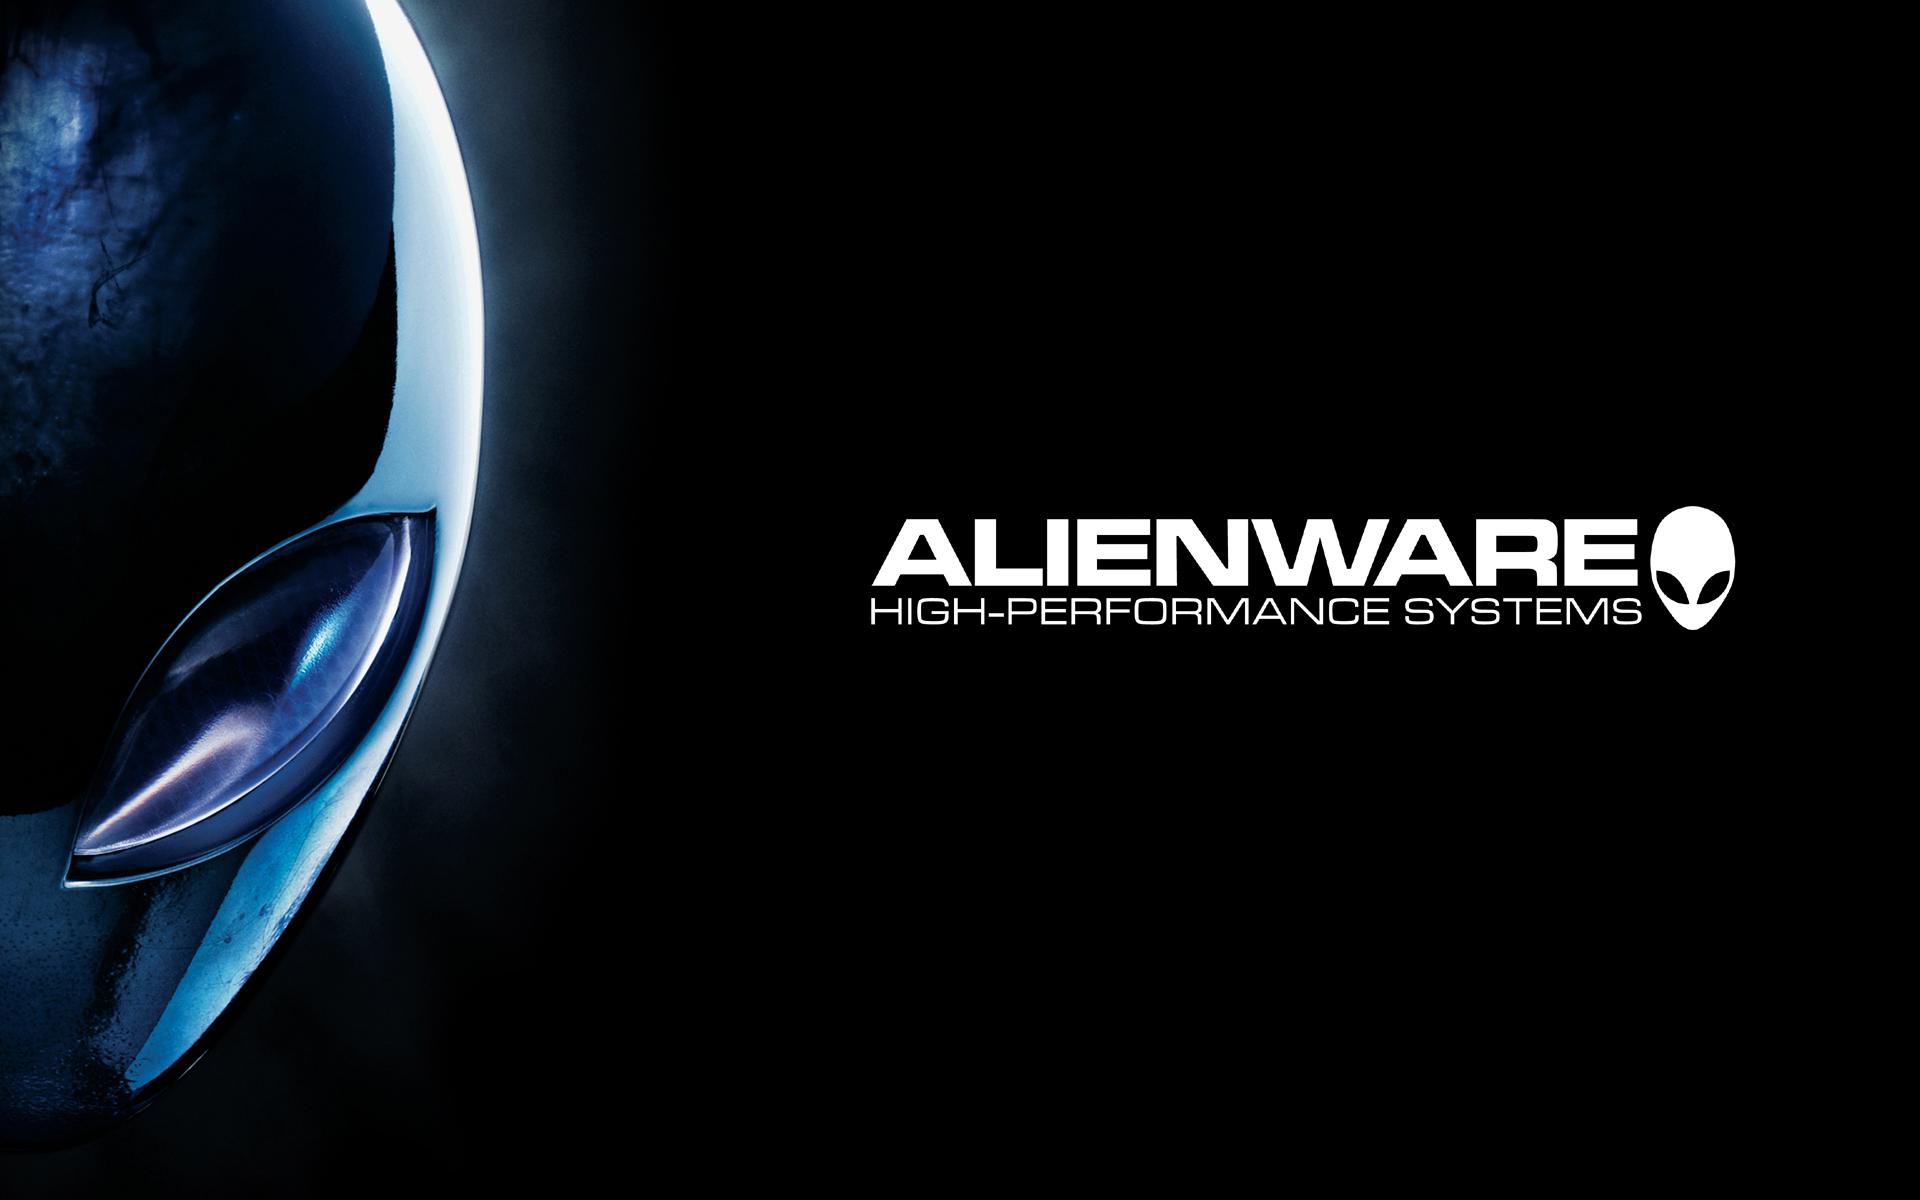 Alienware Wallpaper HD 1920x1200